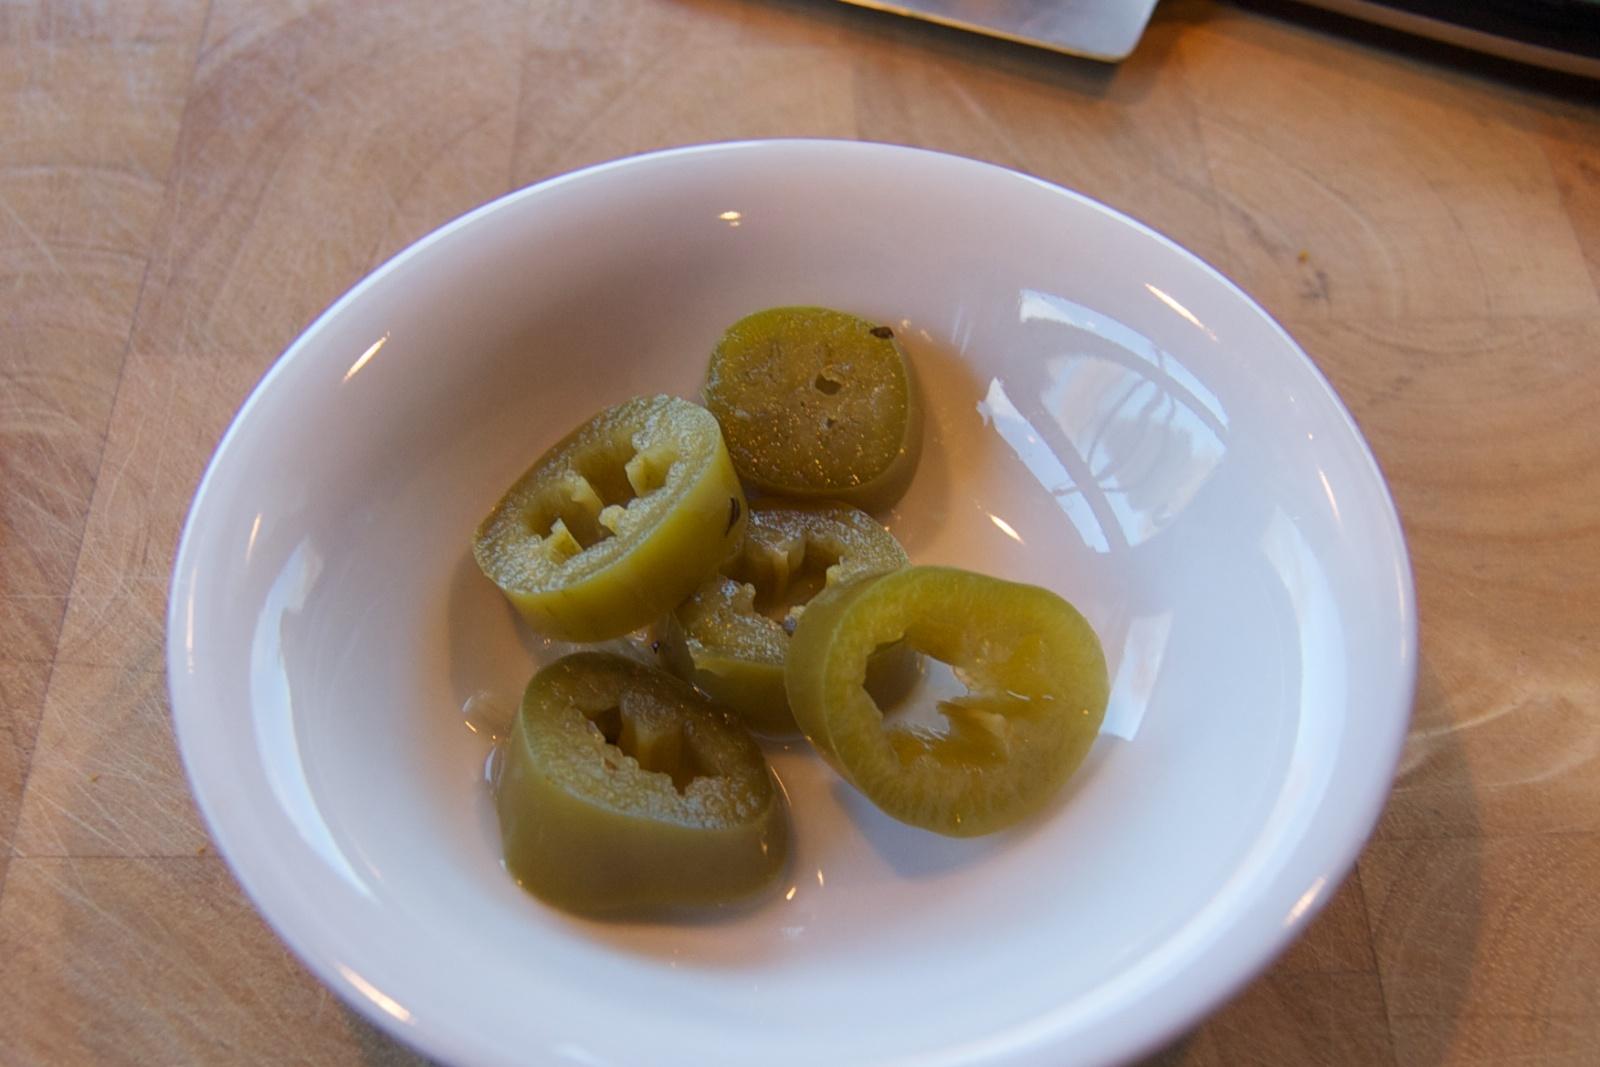 http://blog.rickk.com/food/2013/11/13/ate.2013.11.13.c4.jpg